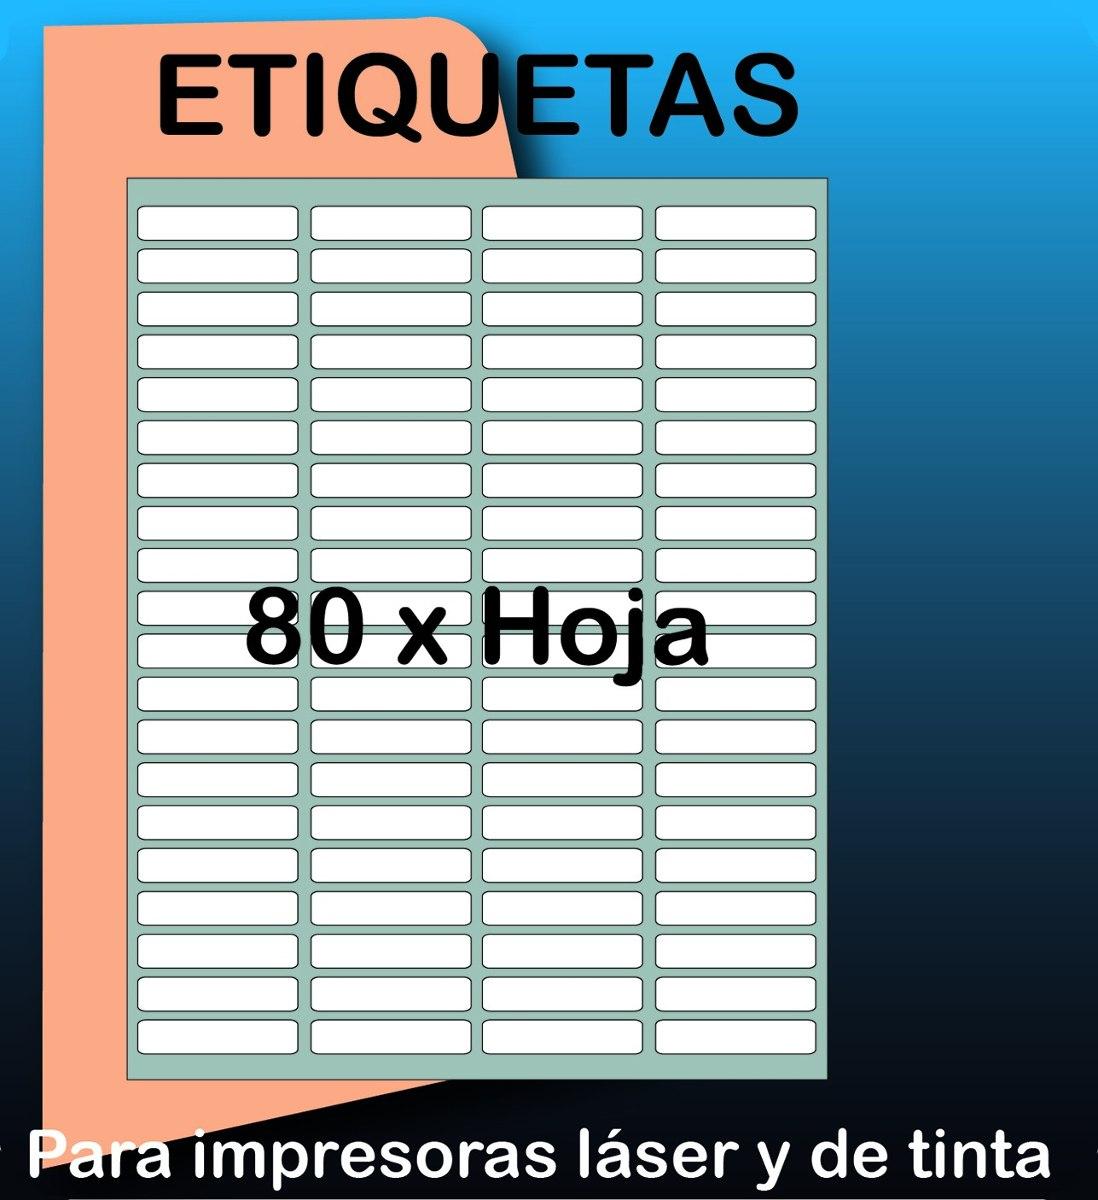 2000 Etiquetas Autoadhesivas De 4.4 X 1.3 Cm Precortadas - Bs. 488 ...